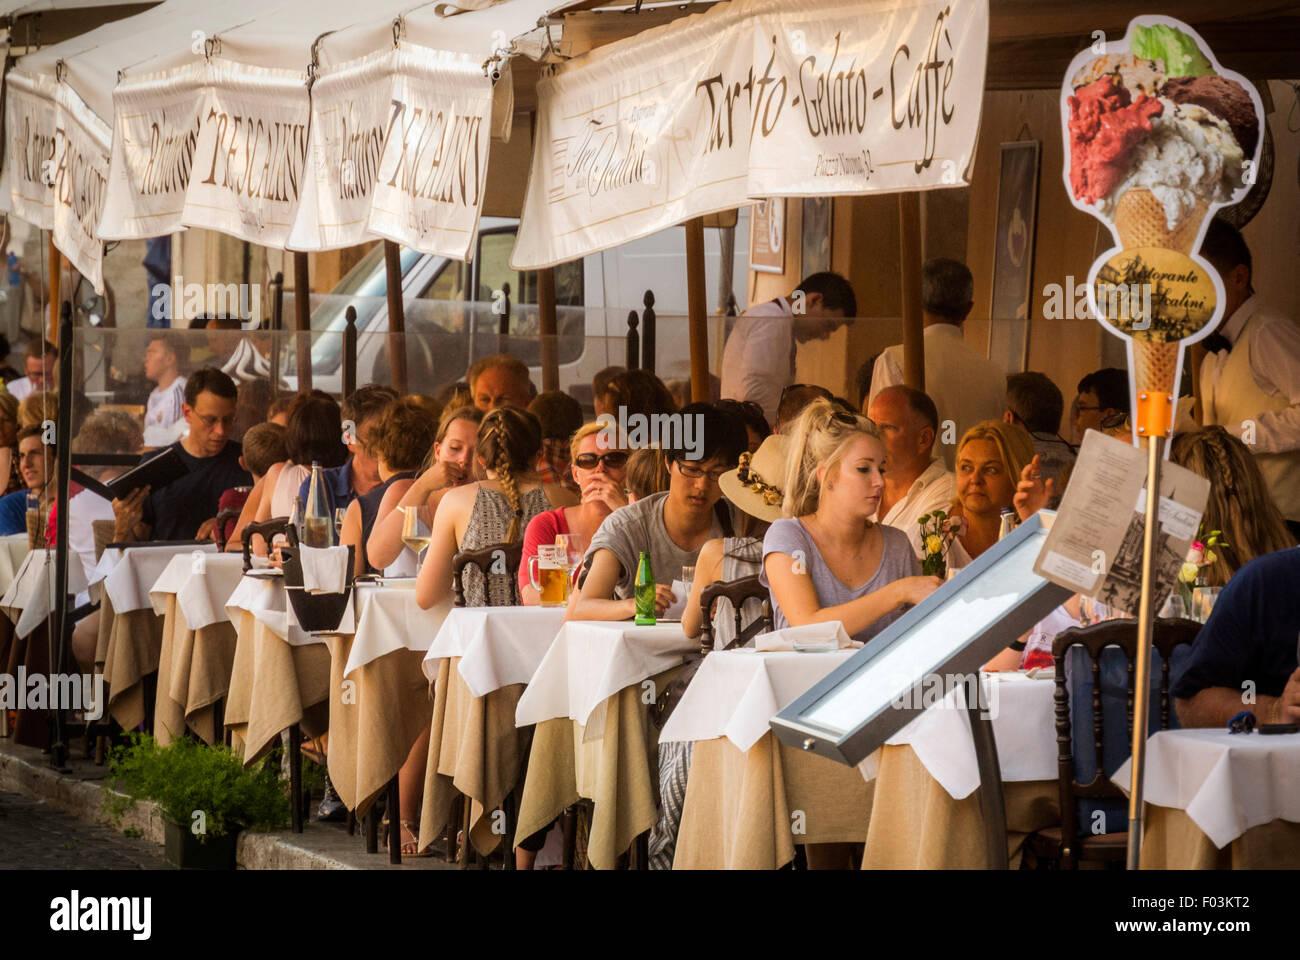 Alfresco dining. Rome, Italy. - Stock Image